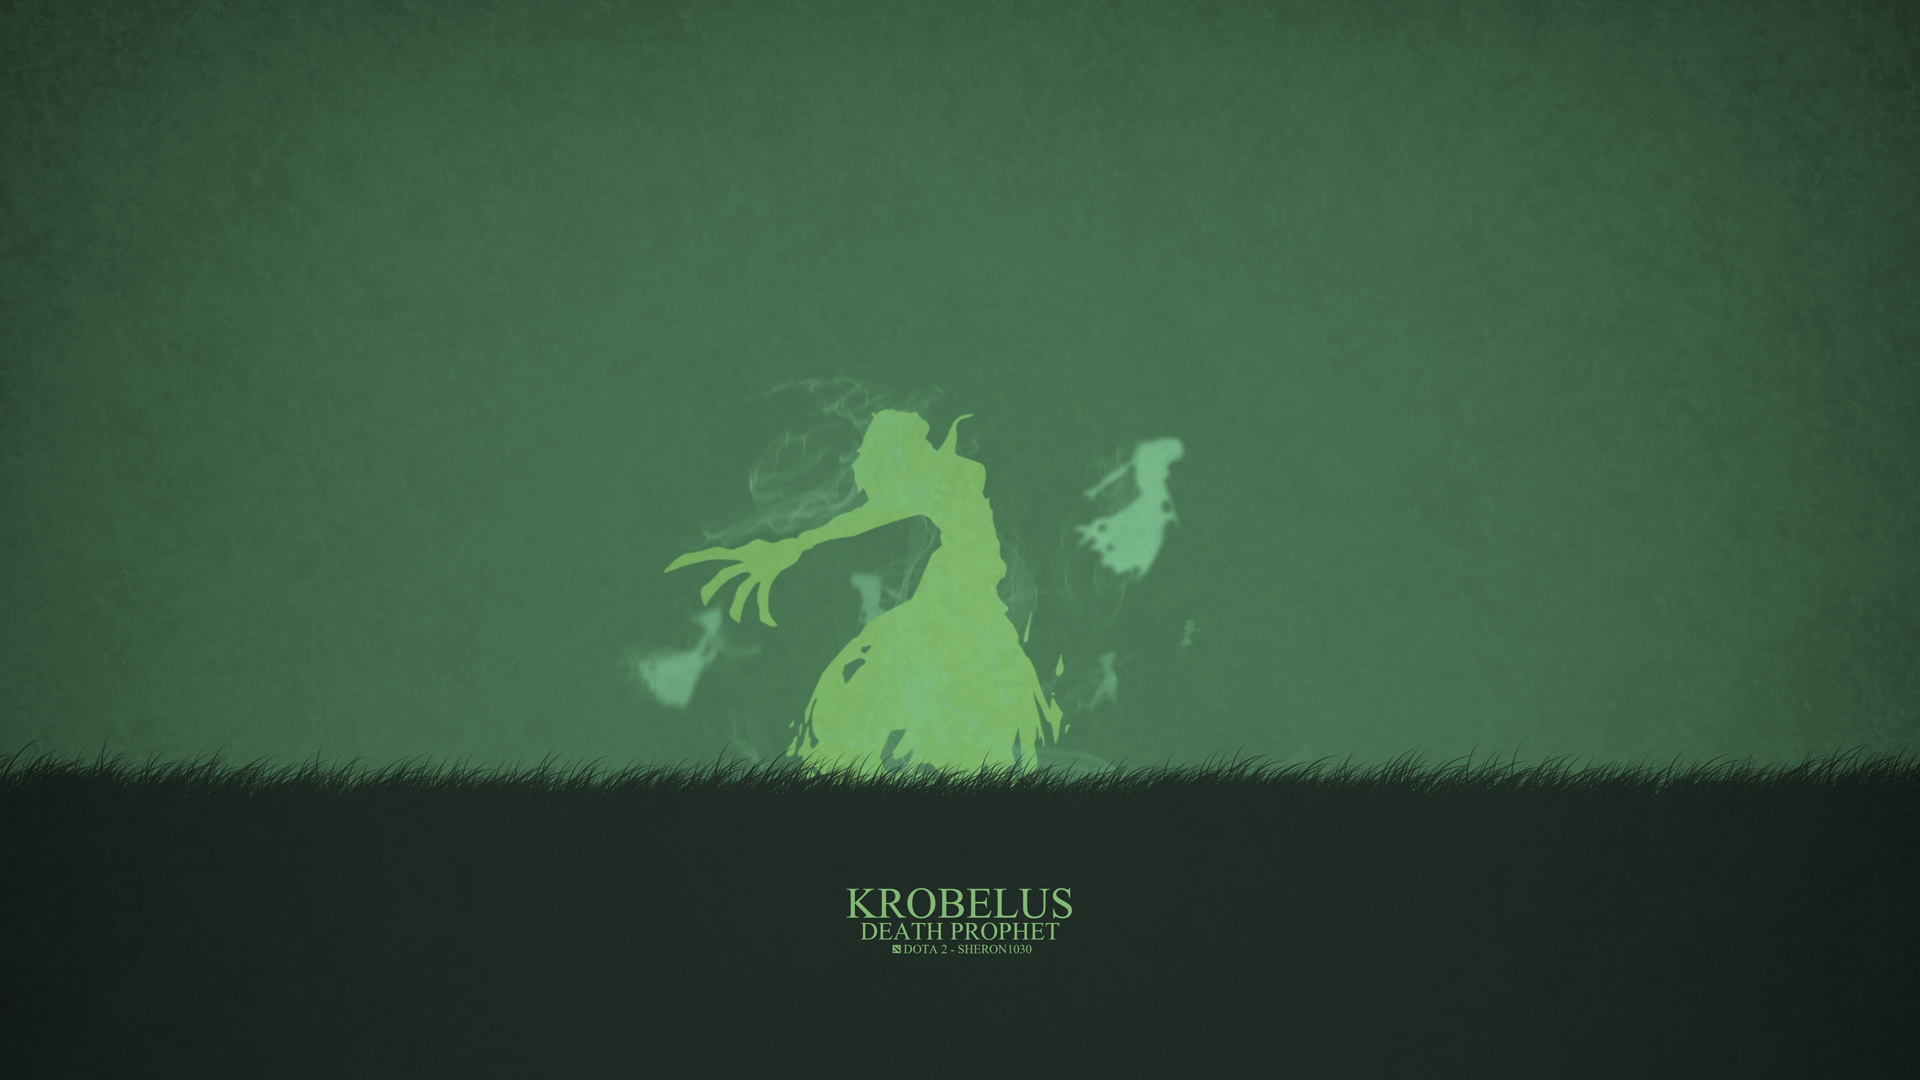 Death Prophet Krobelus download dota 2 heroes minimalist silhouette HD ...